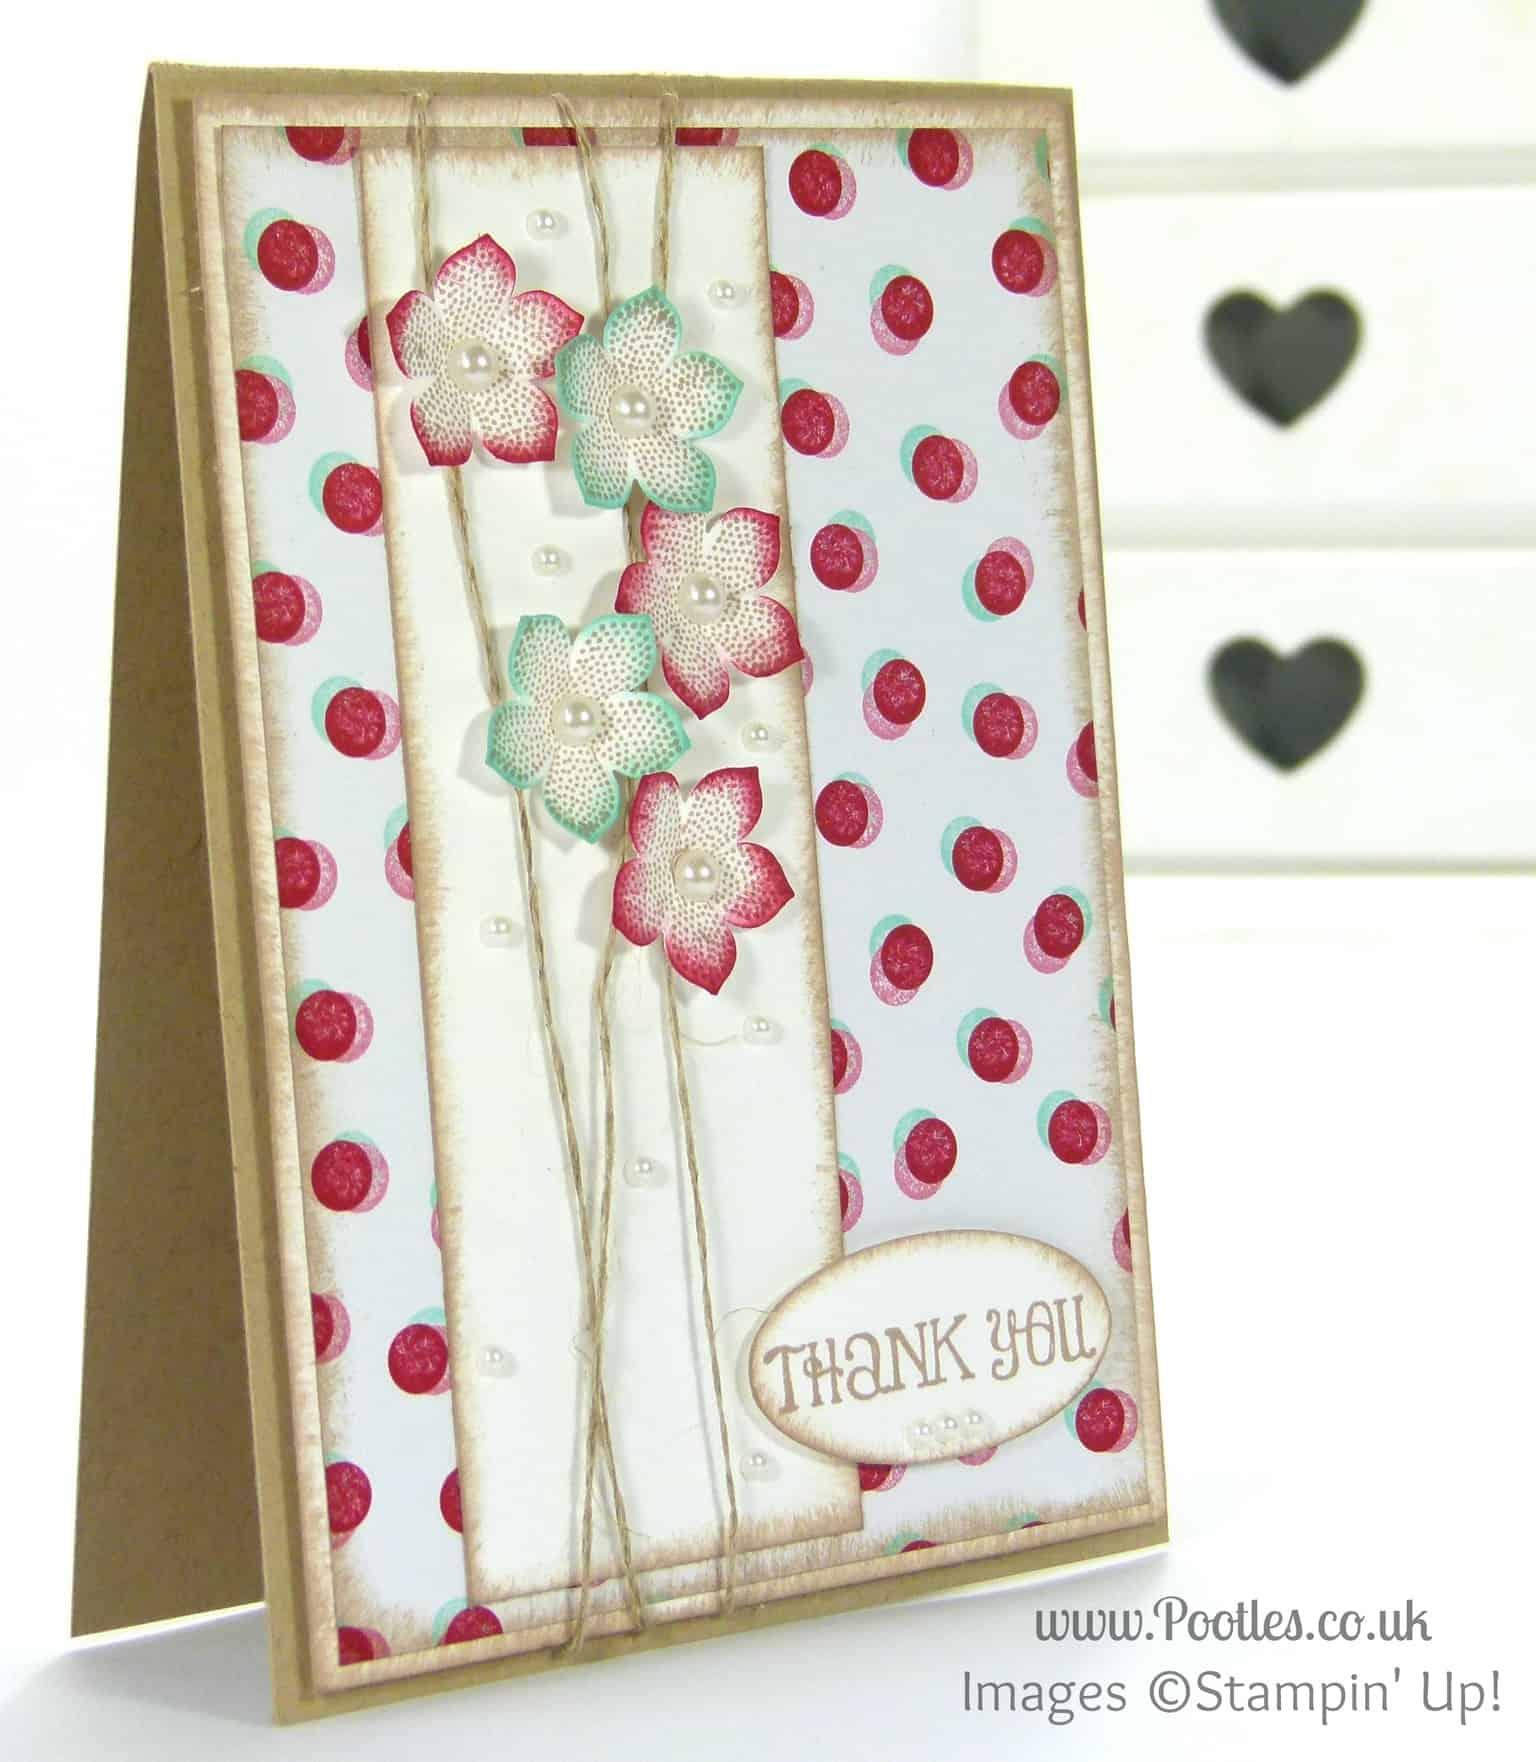 Stampin' Up! UK Demonstrator Pootles - Pretty Petite Fresh Prints Floral Card